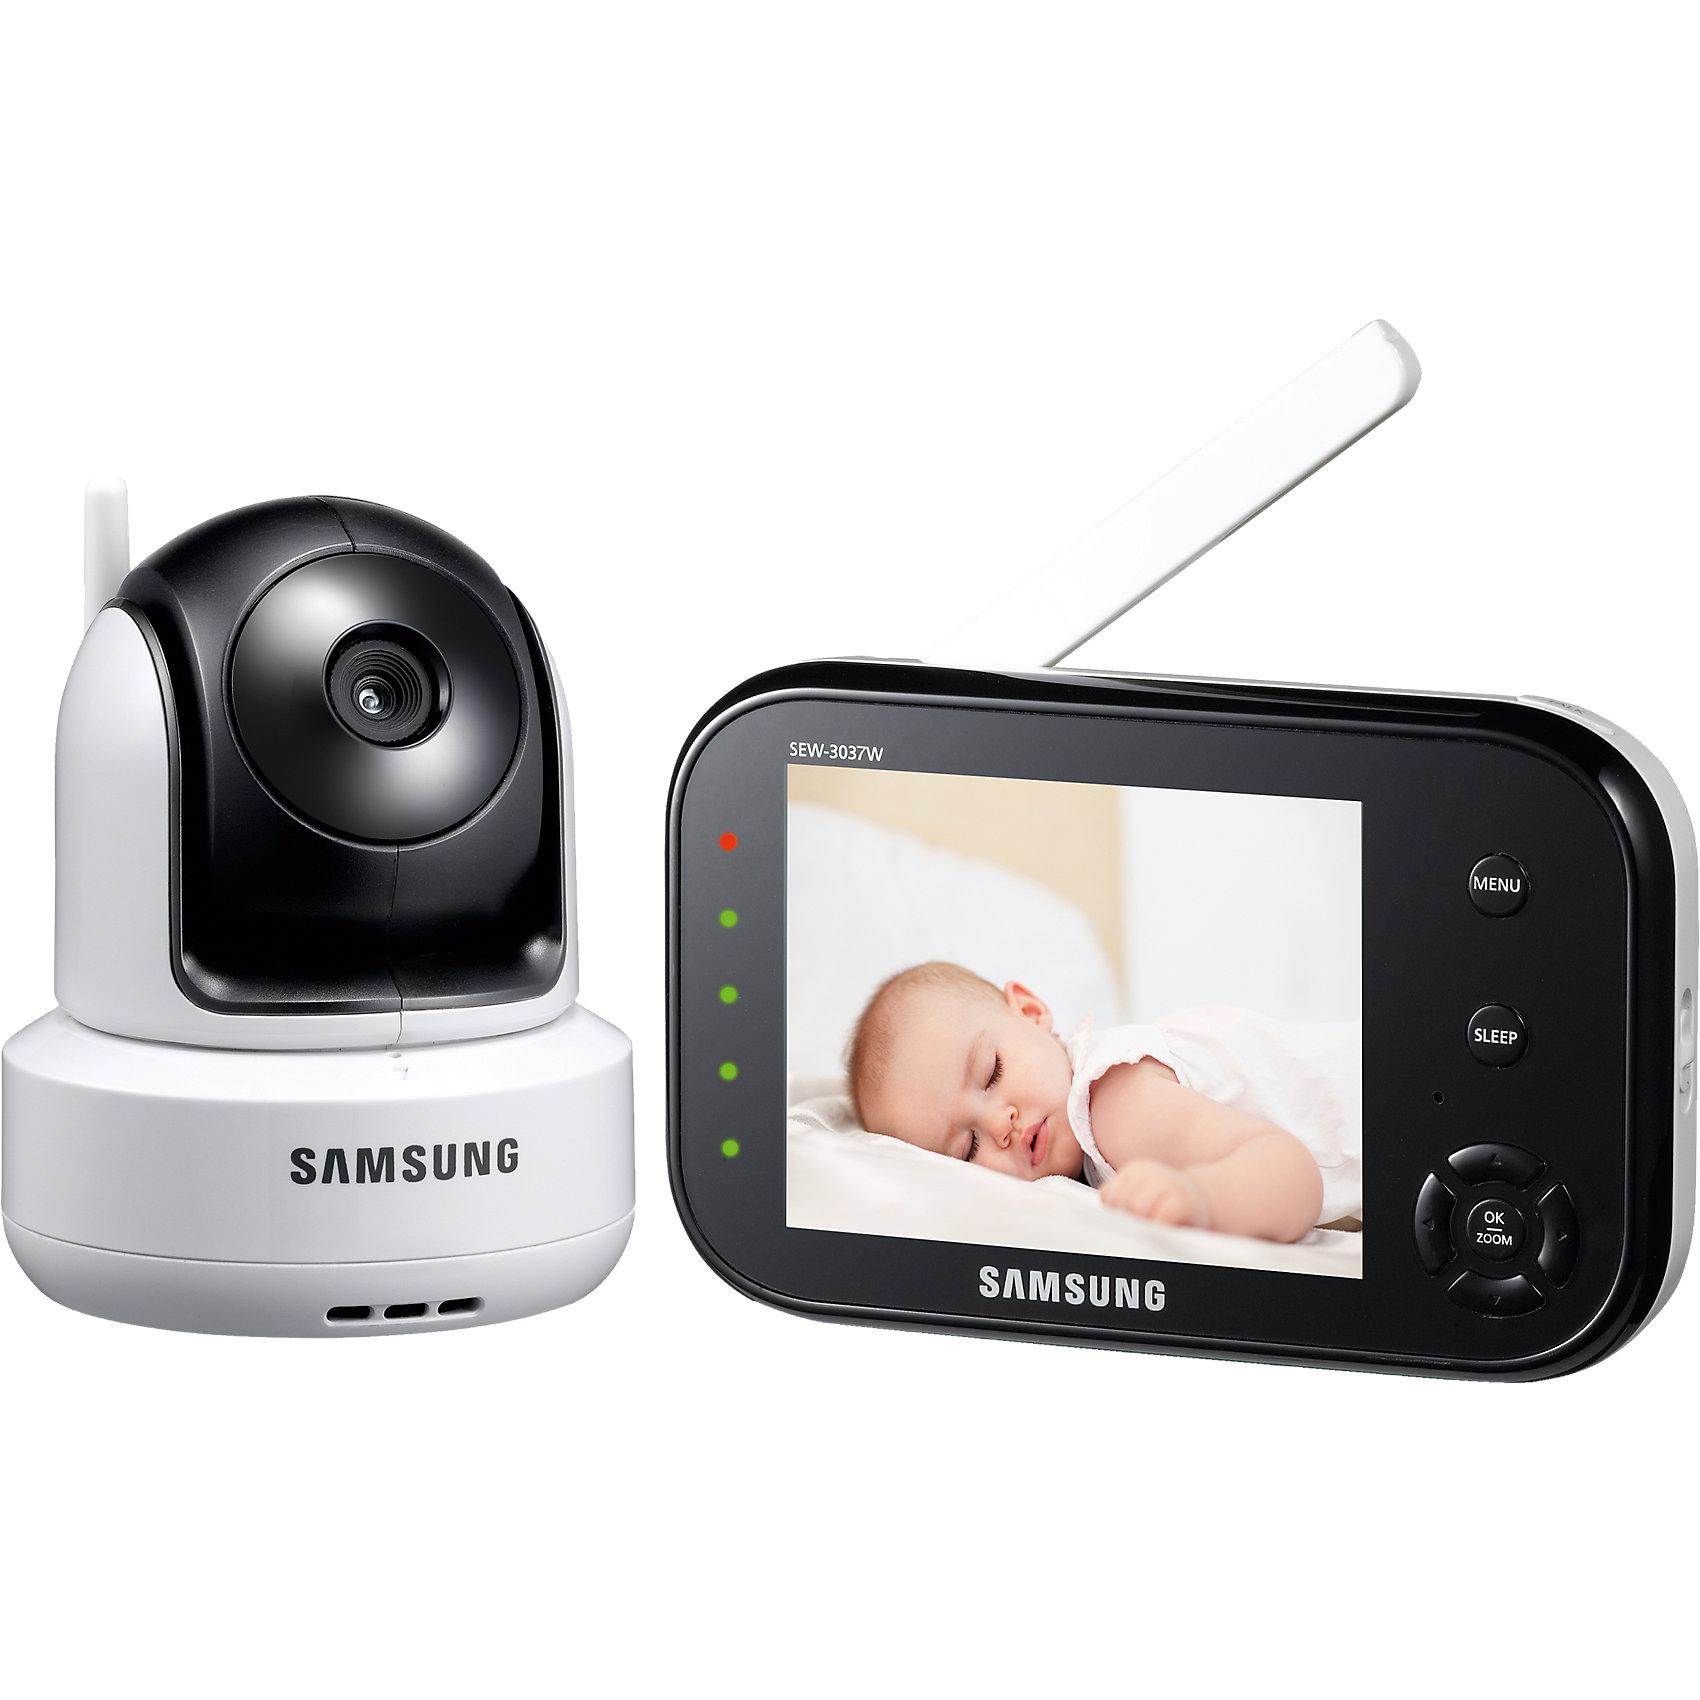 Samsung Видеоняня SEW-3037WP, Samsung samsung sew 3037 wp